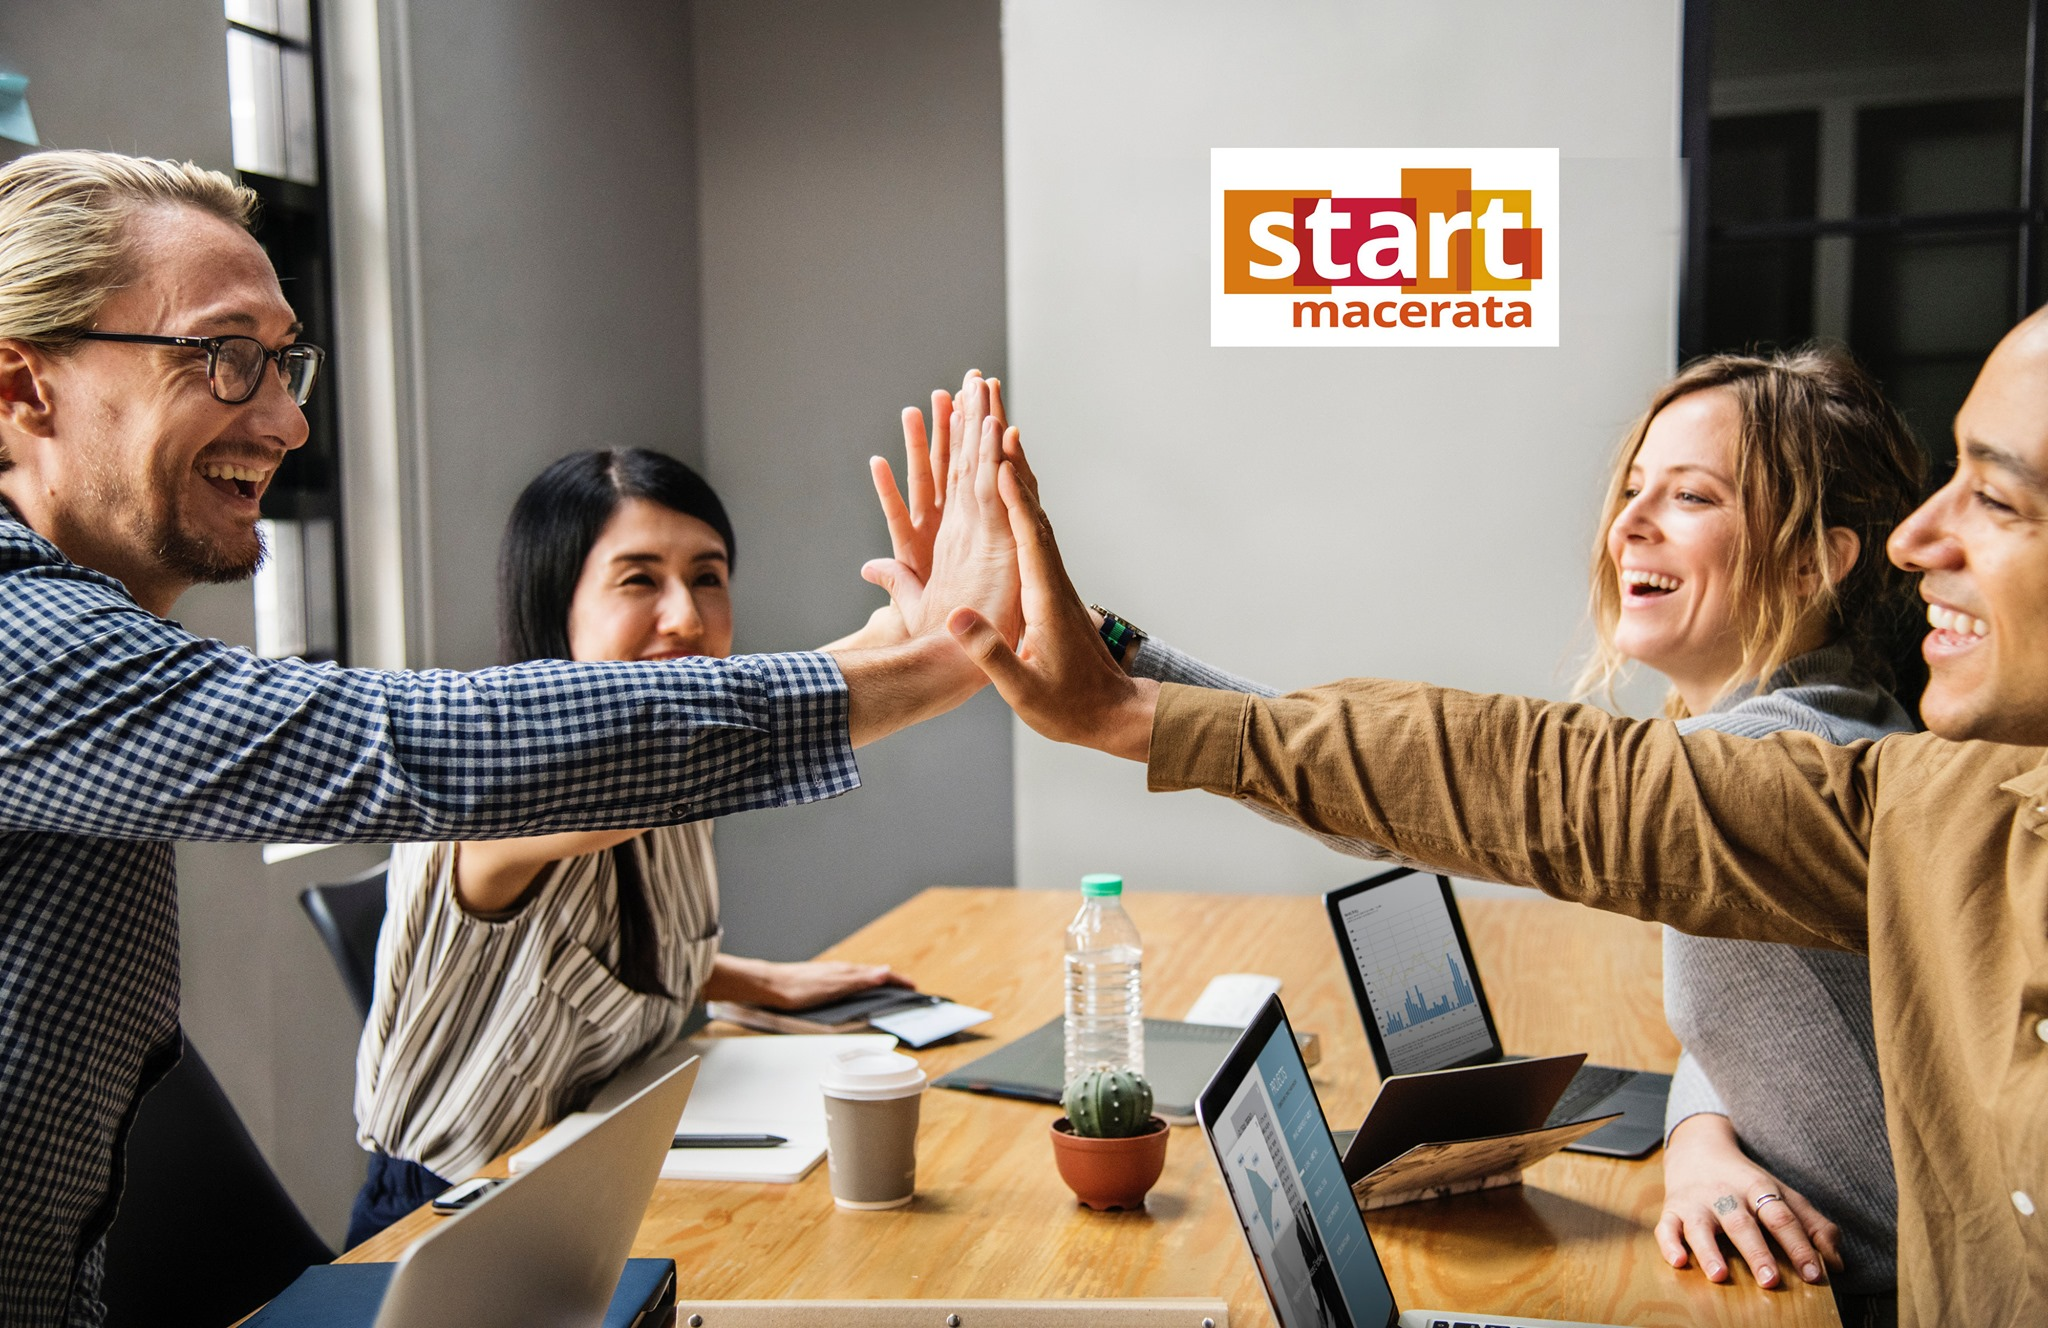 START Macerata, bando per piccole e medie imprese